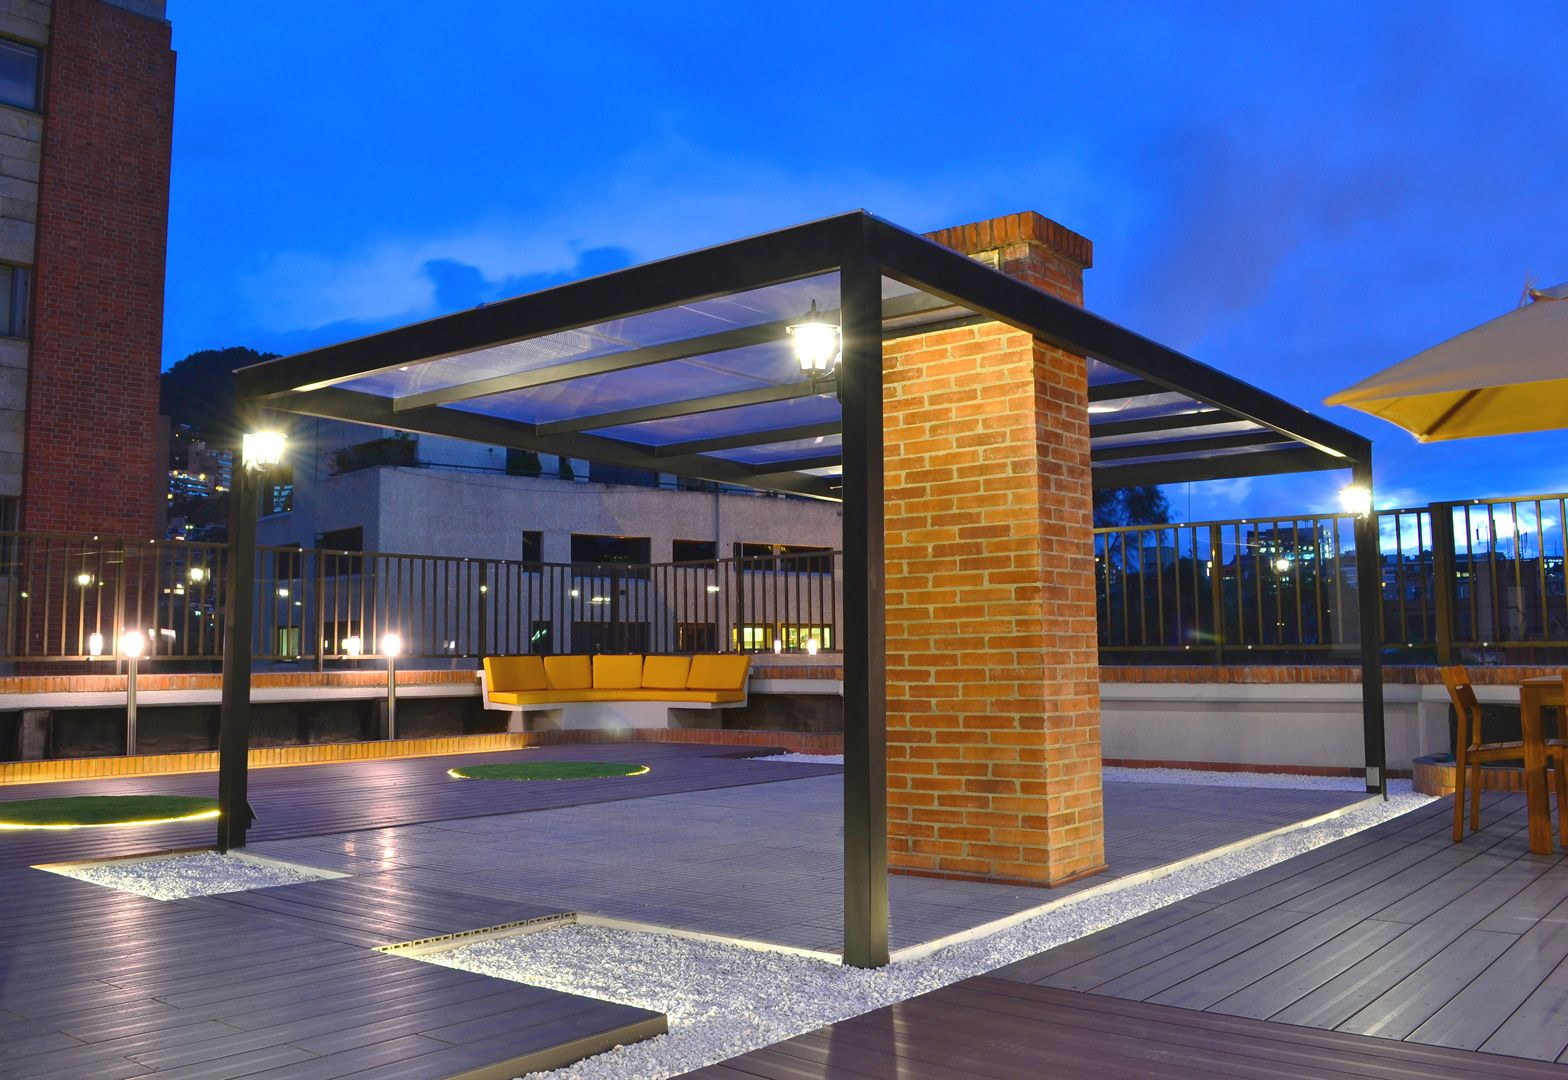 Terraza Edificio Golf Palace Residencial Propuesta De Diseño